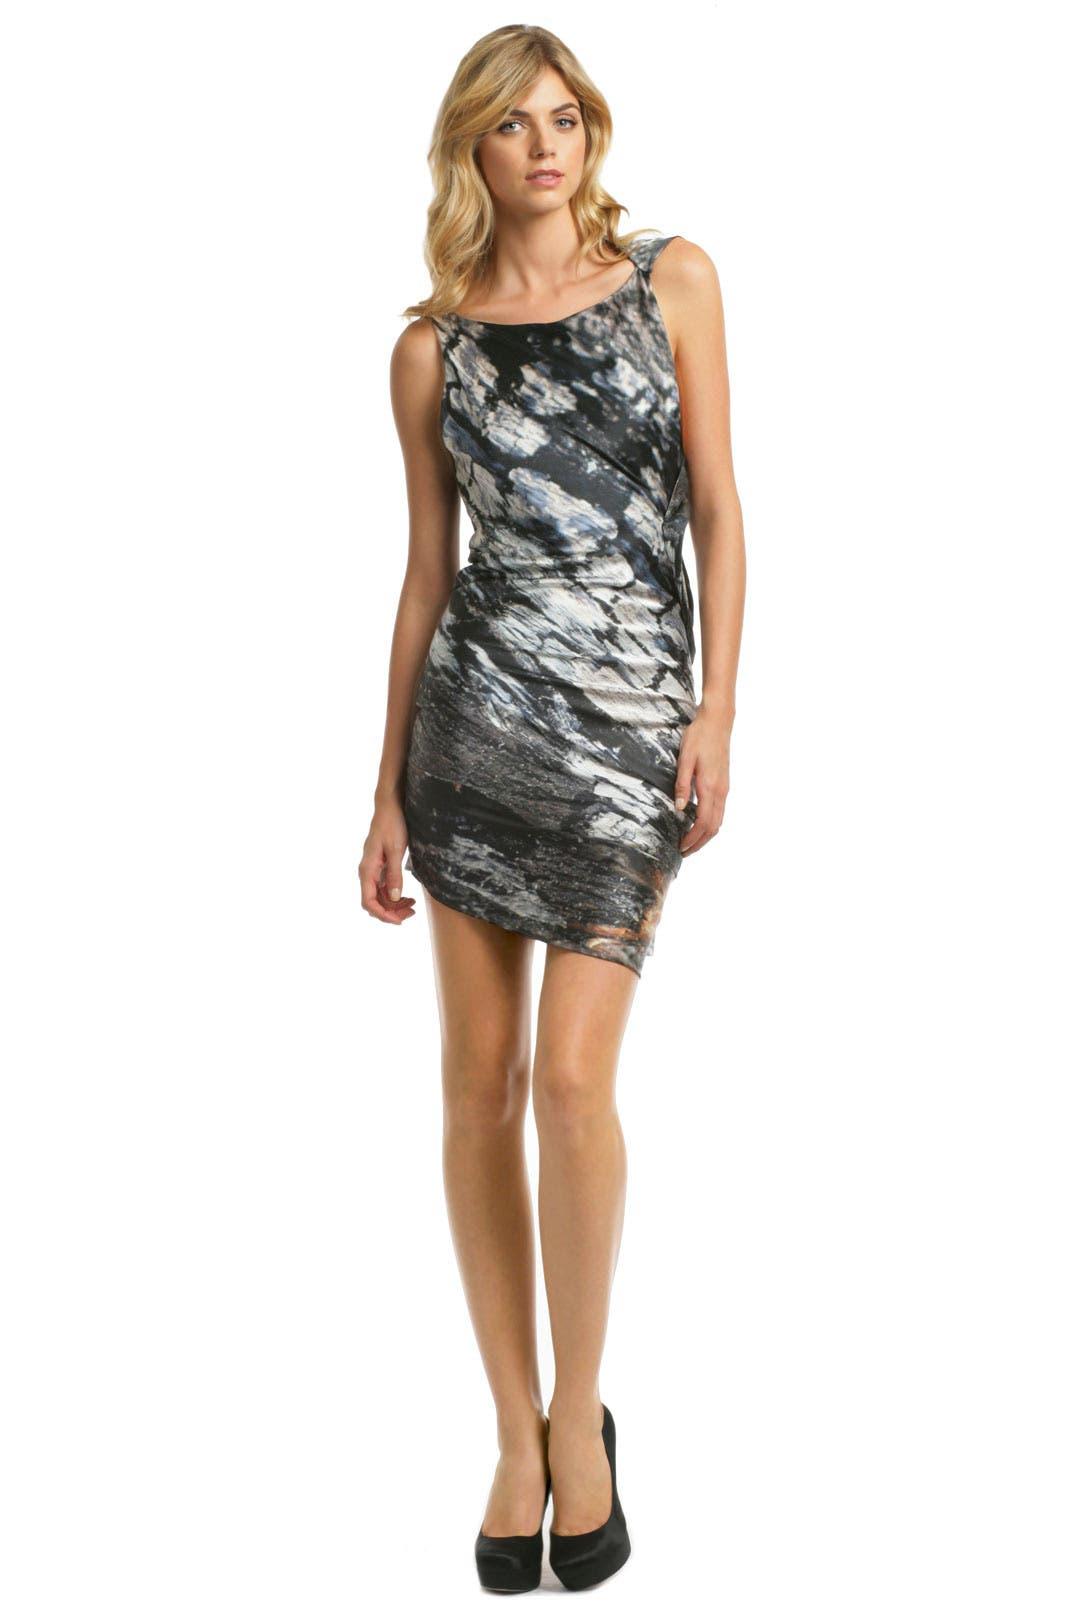 Gravel Mod Dress by Daniel Vosovic